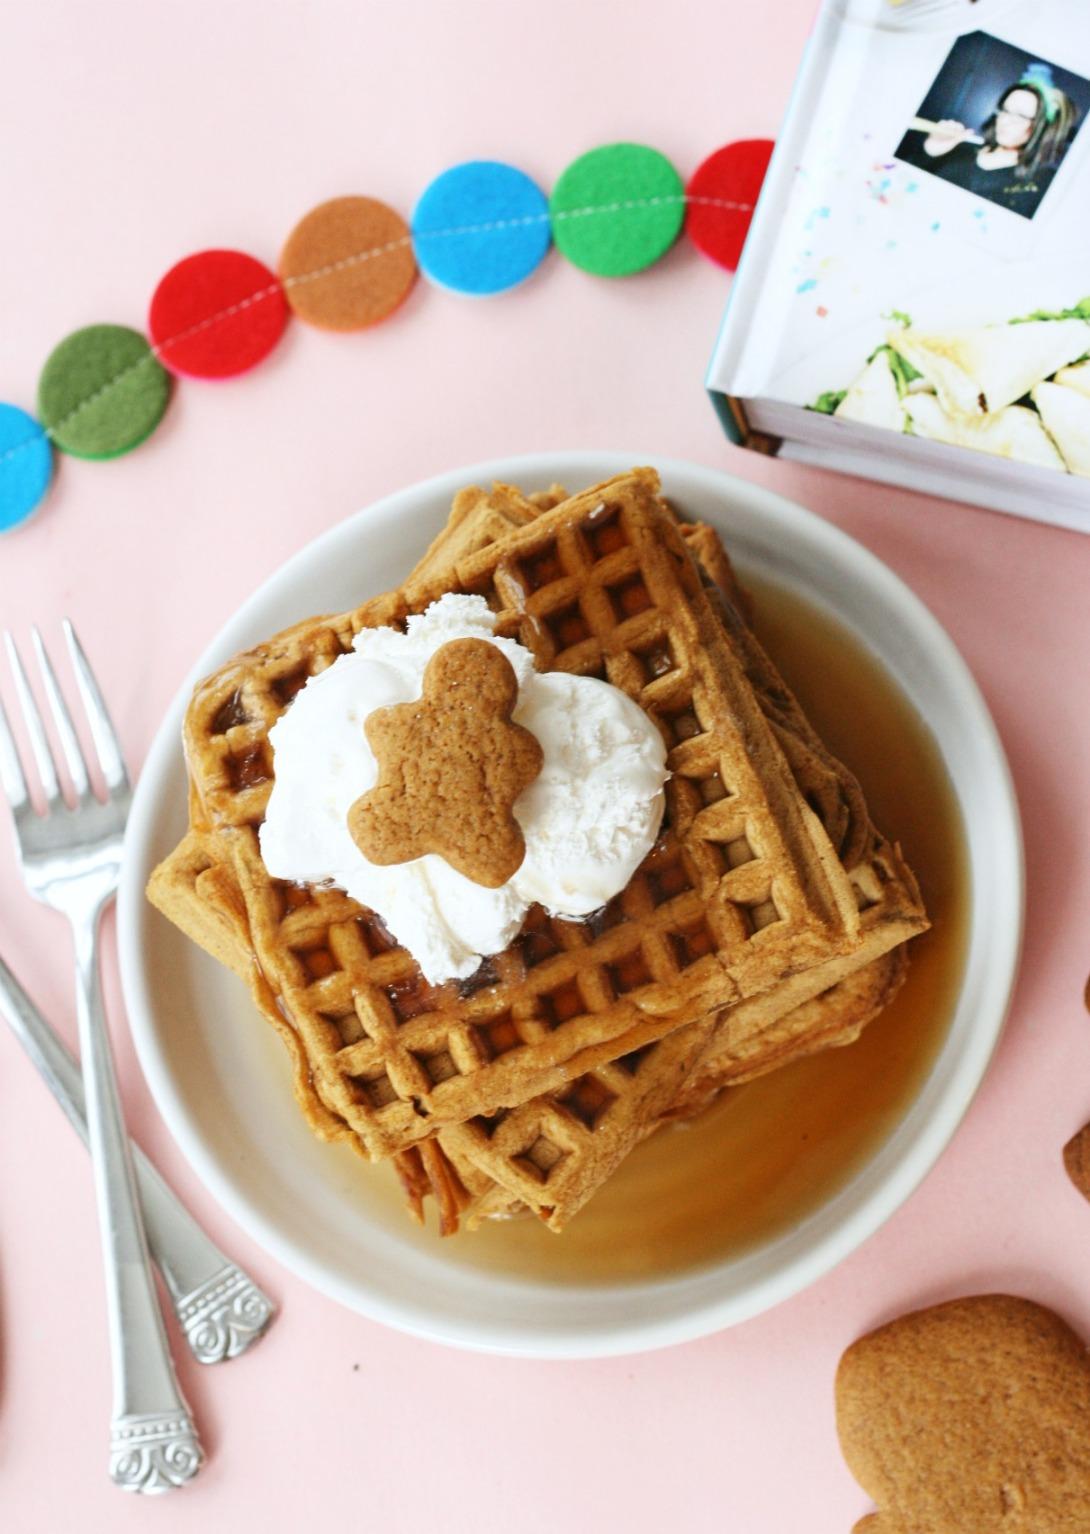 the-superfun-times-vegan-holiday-cookbook-gingerbread-waffles-5